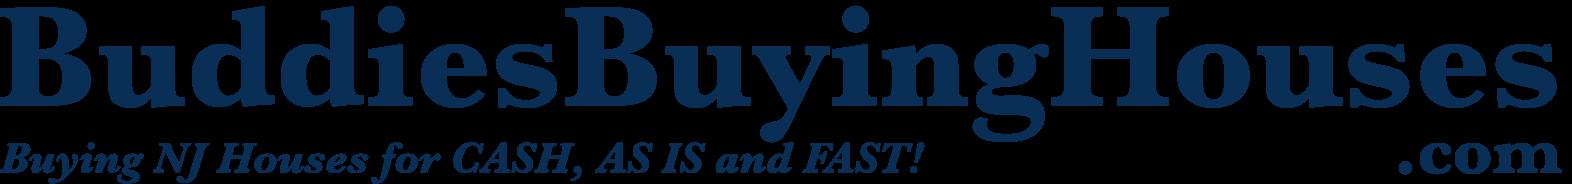 BuddiesBuyingHouses.com logo